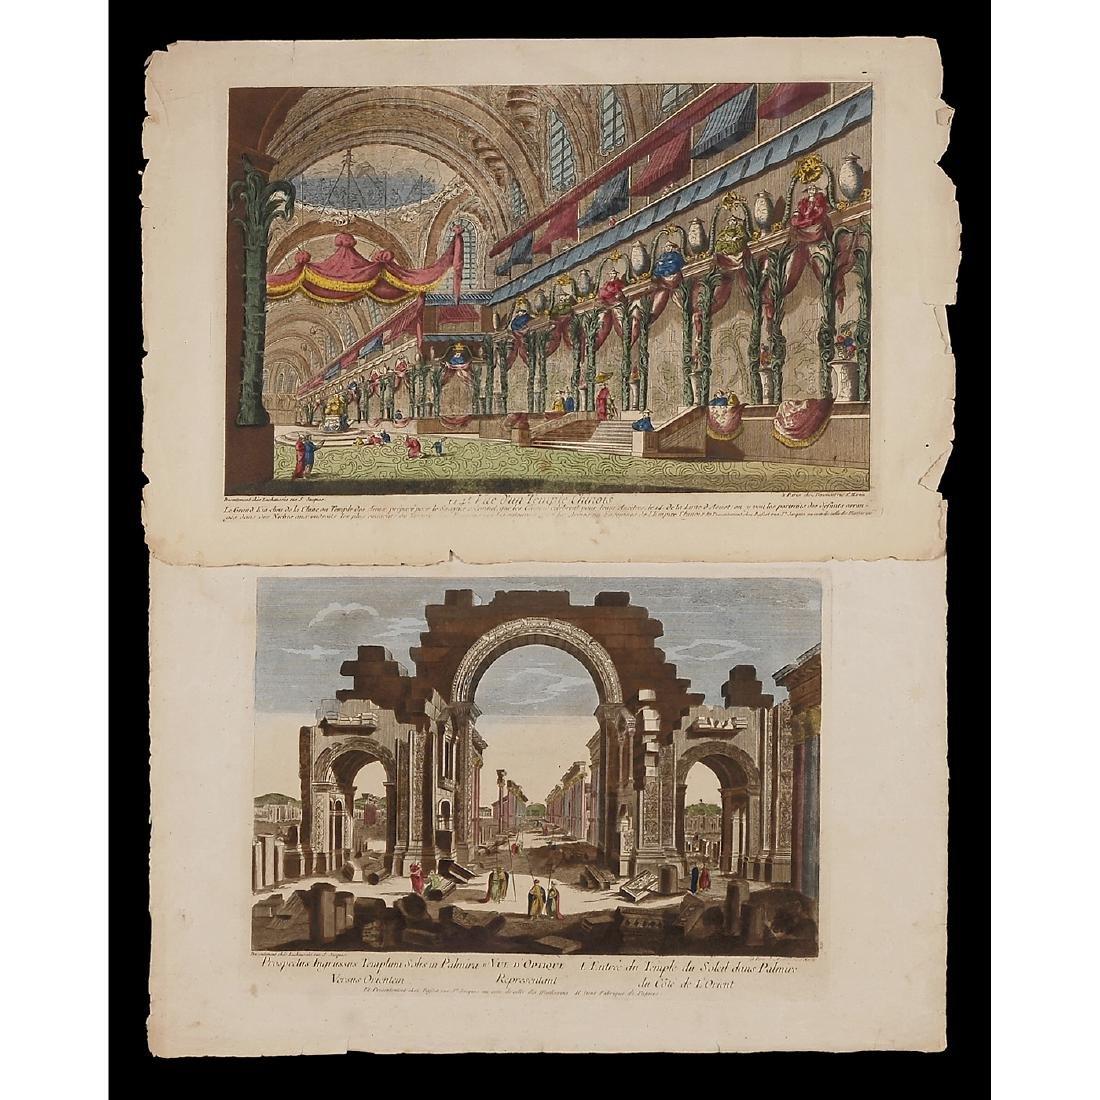 4 Vues d'Optique, c. 1765 - 3